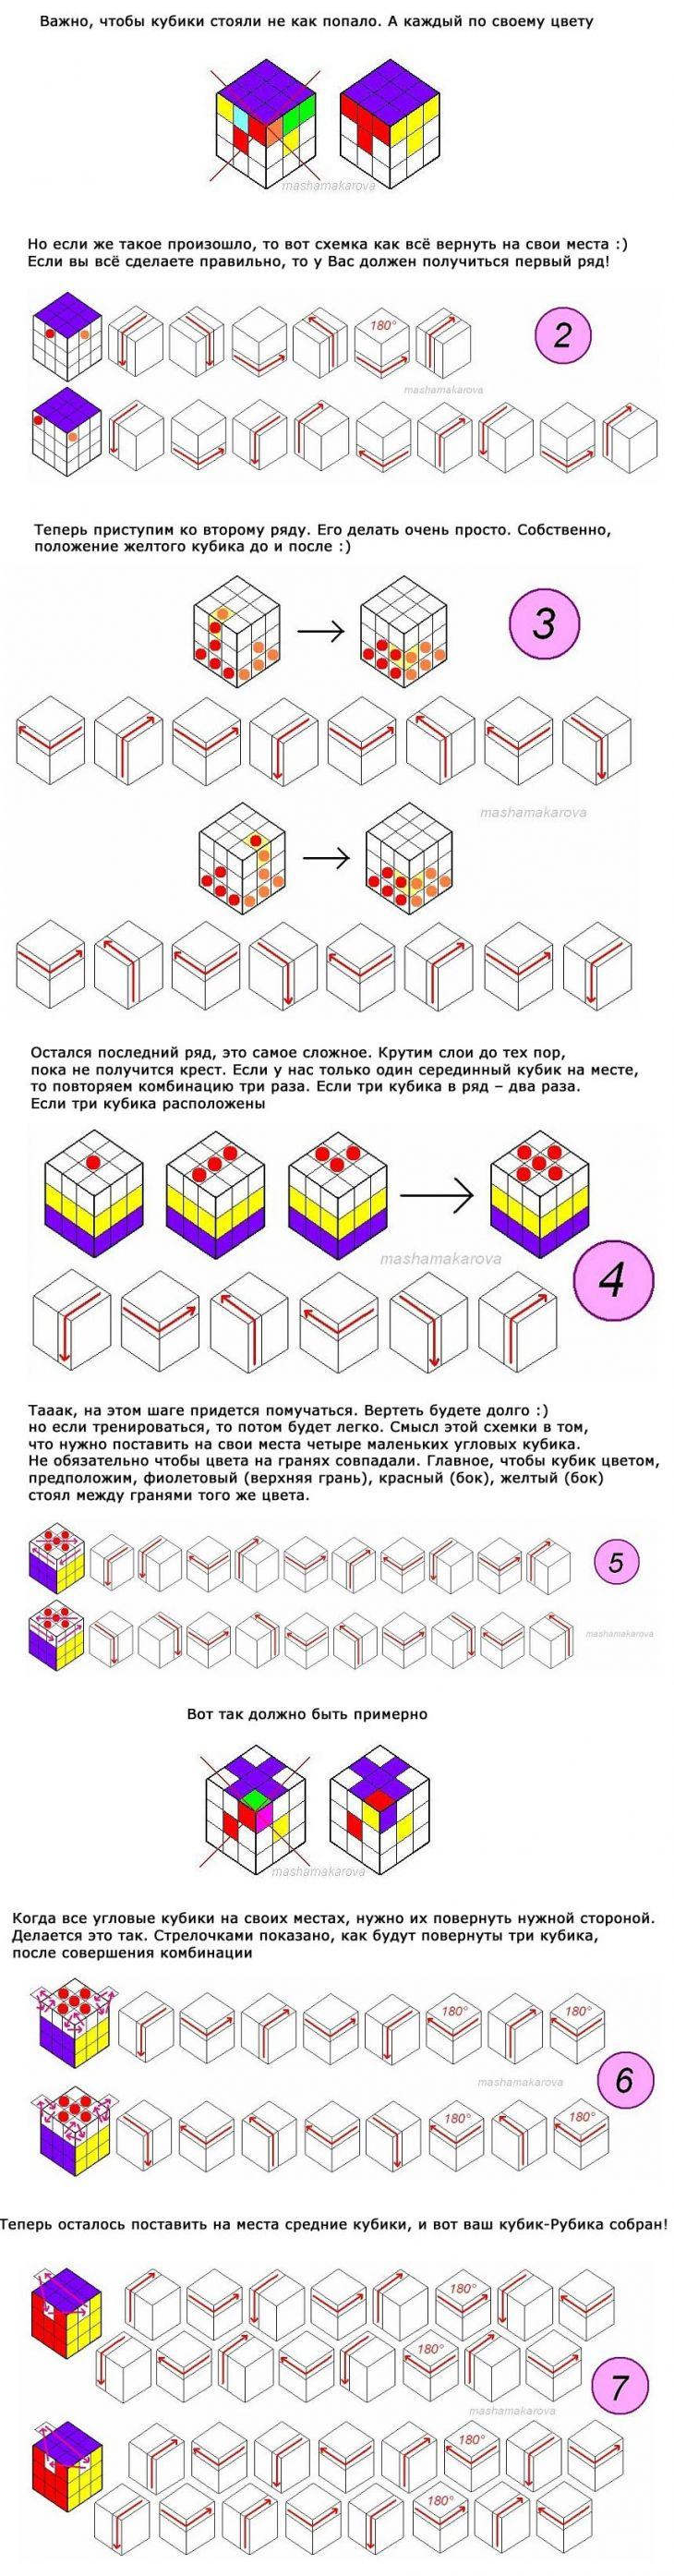 Схема сборки аксис куба